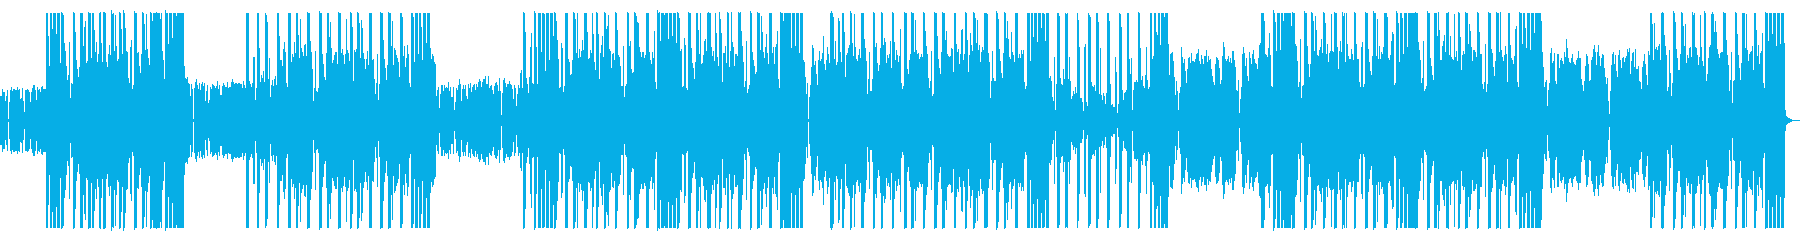 Advanced EDM Trap, Club Beat's reproduced waveform